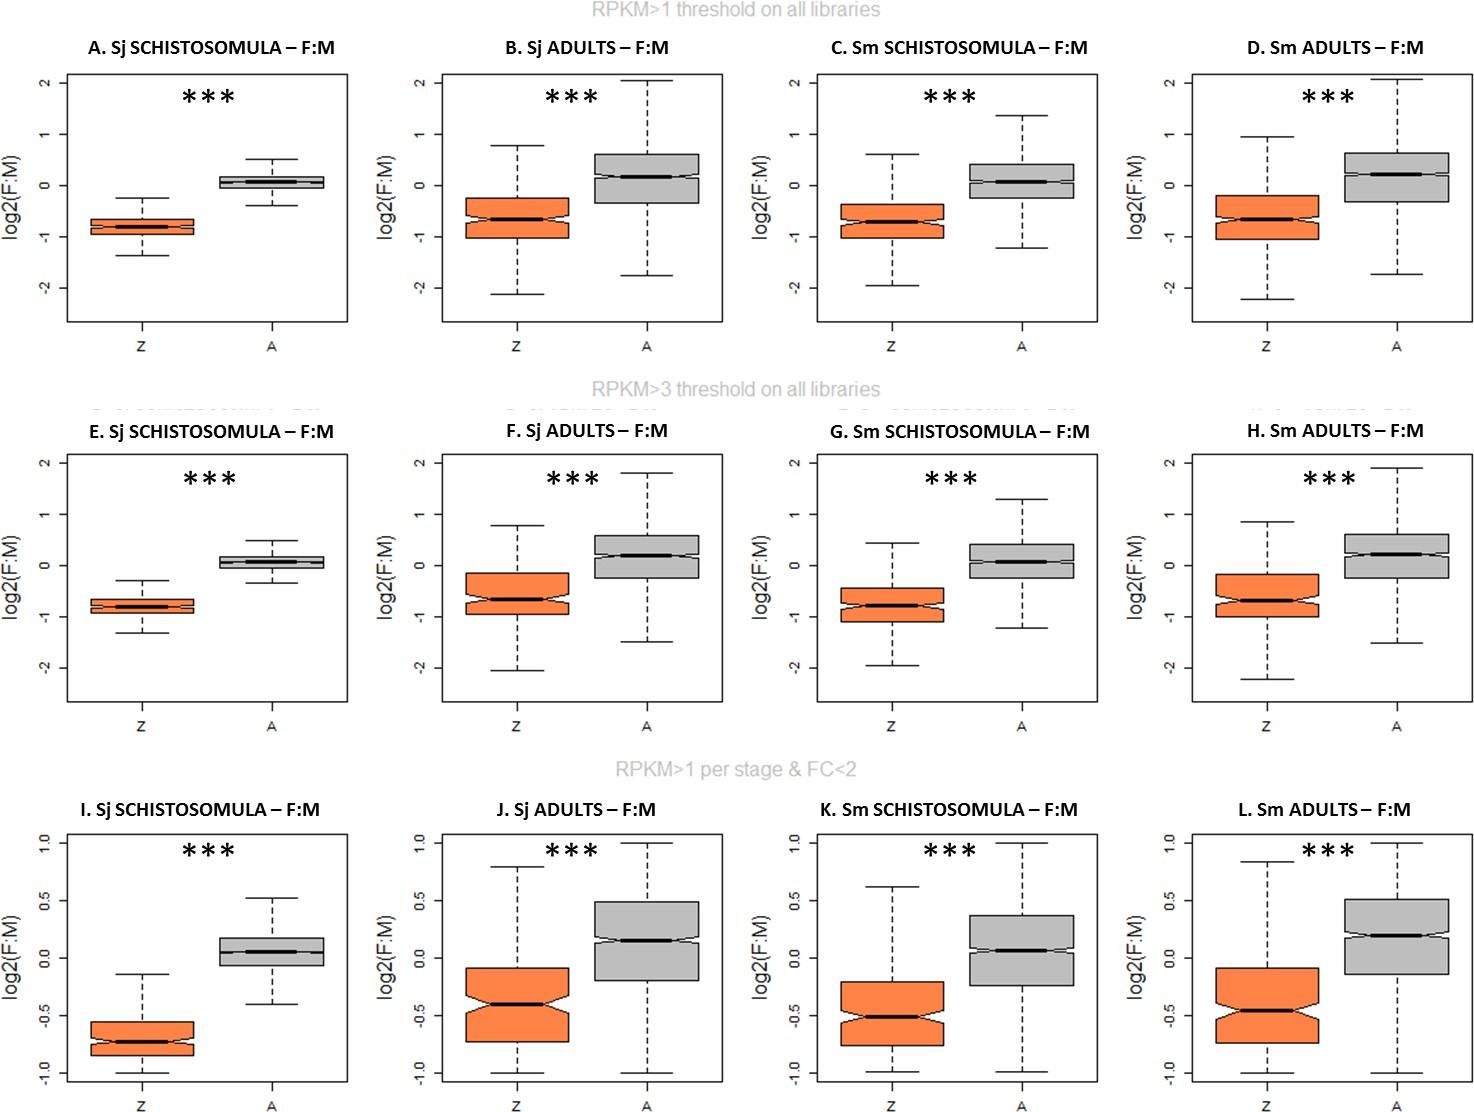 Evolution of gene dosage on the Z-chromosome of schistosome